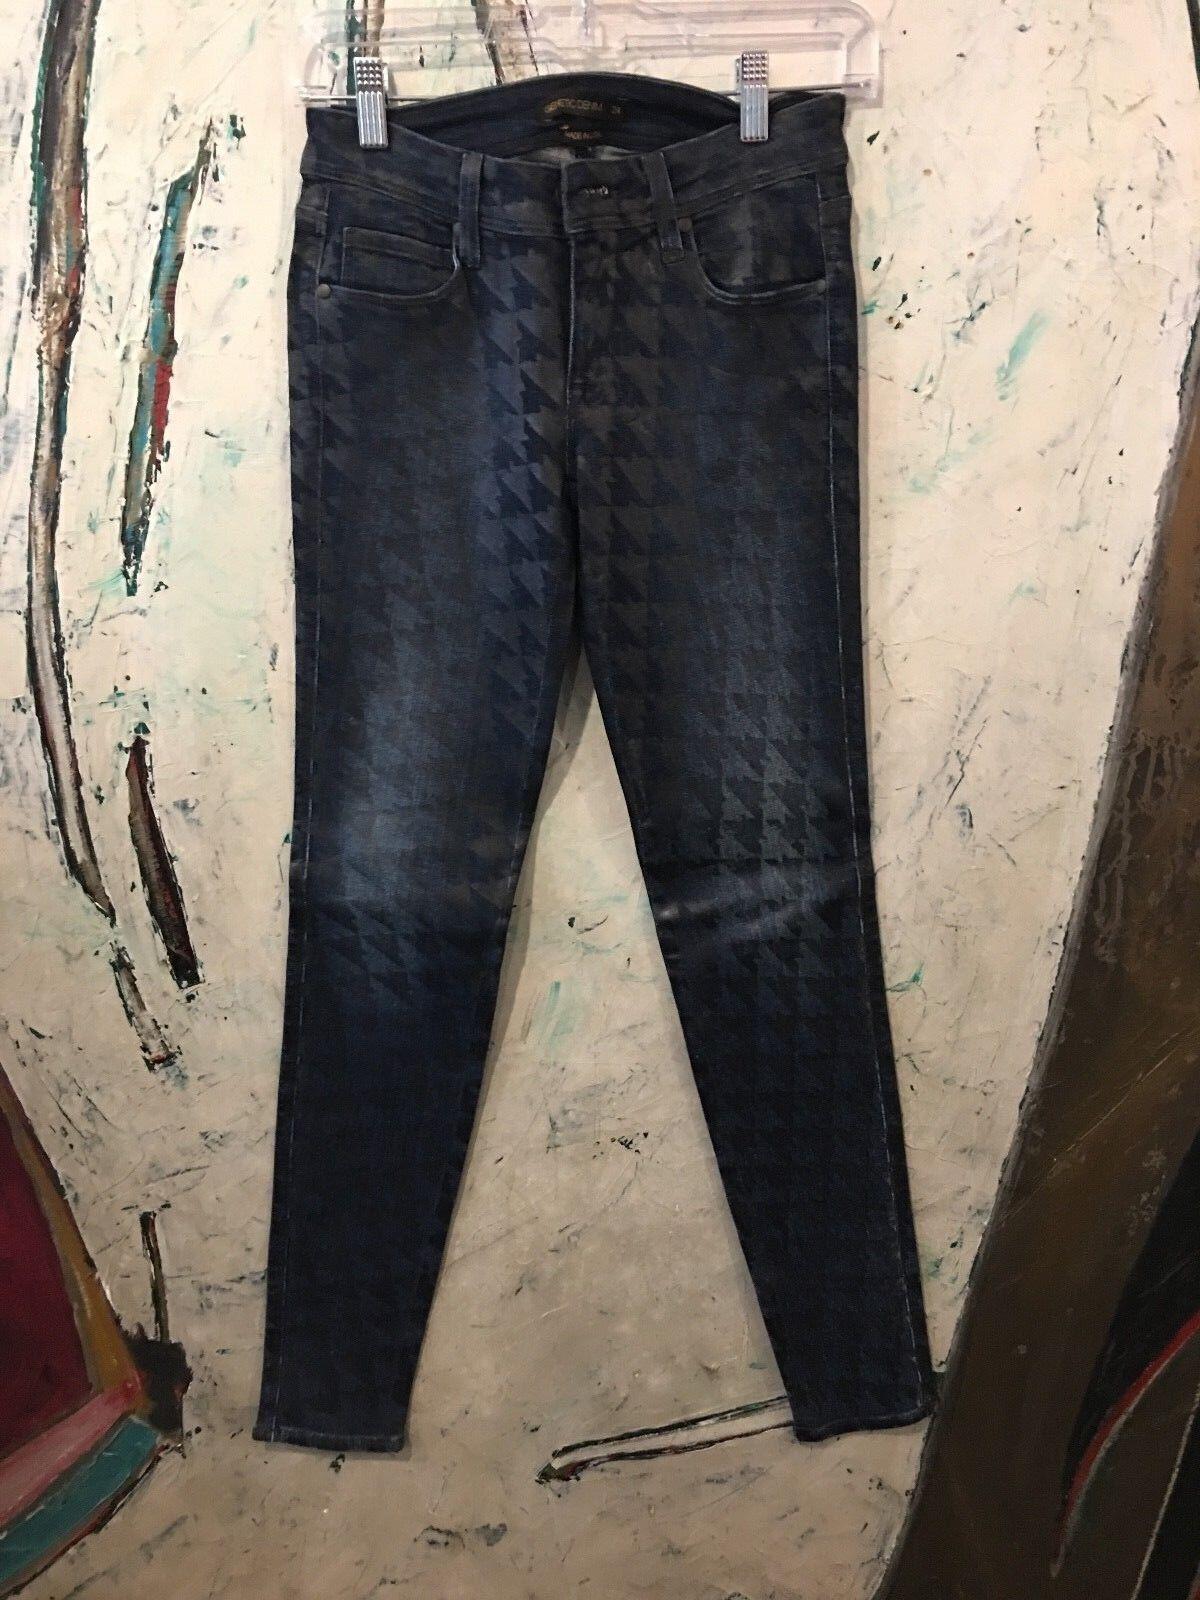 Genetic Denim The Shya Coated Jeans Size 24